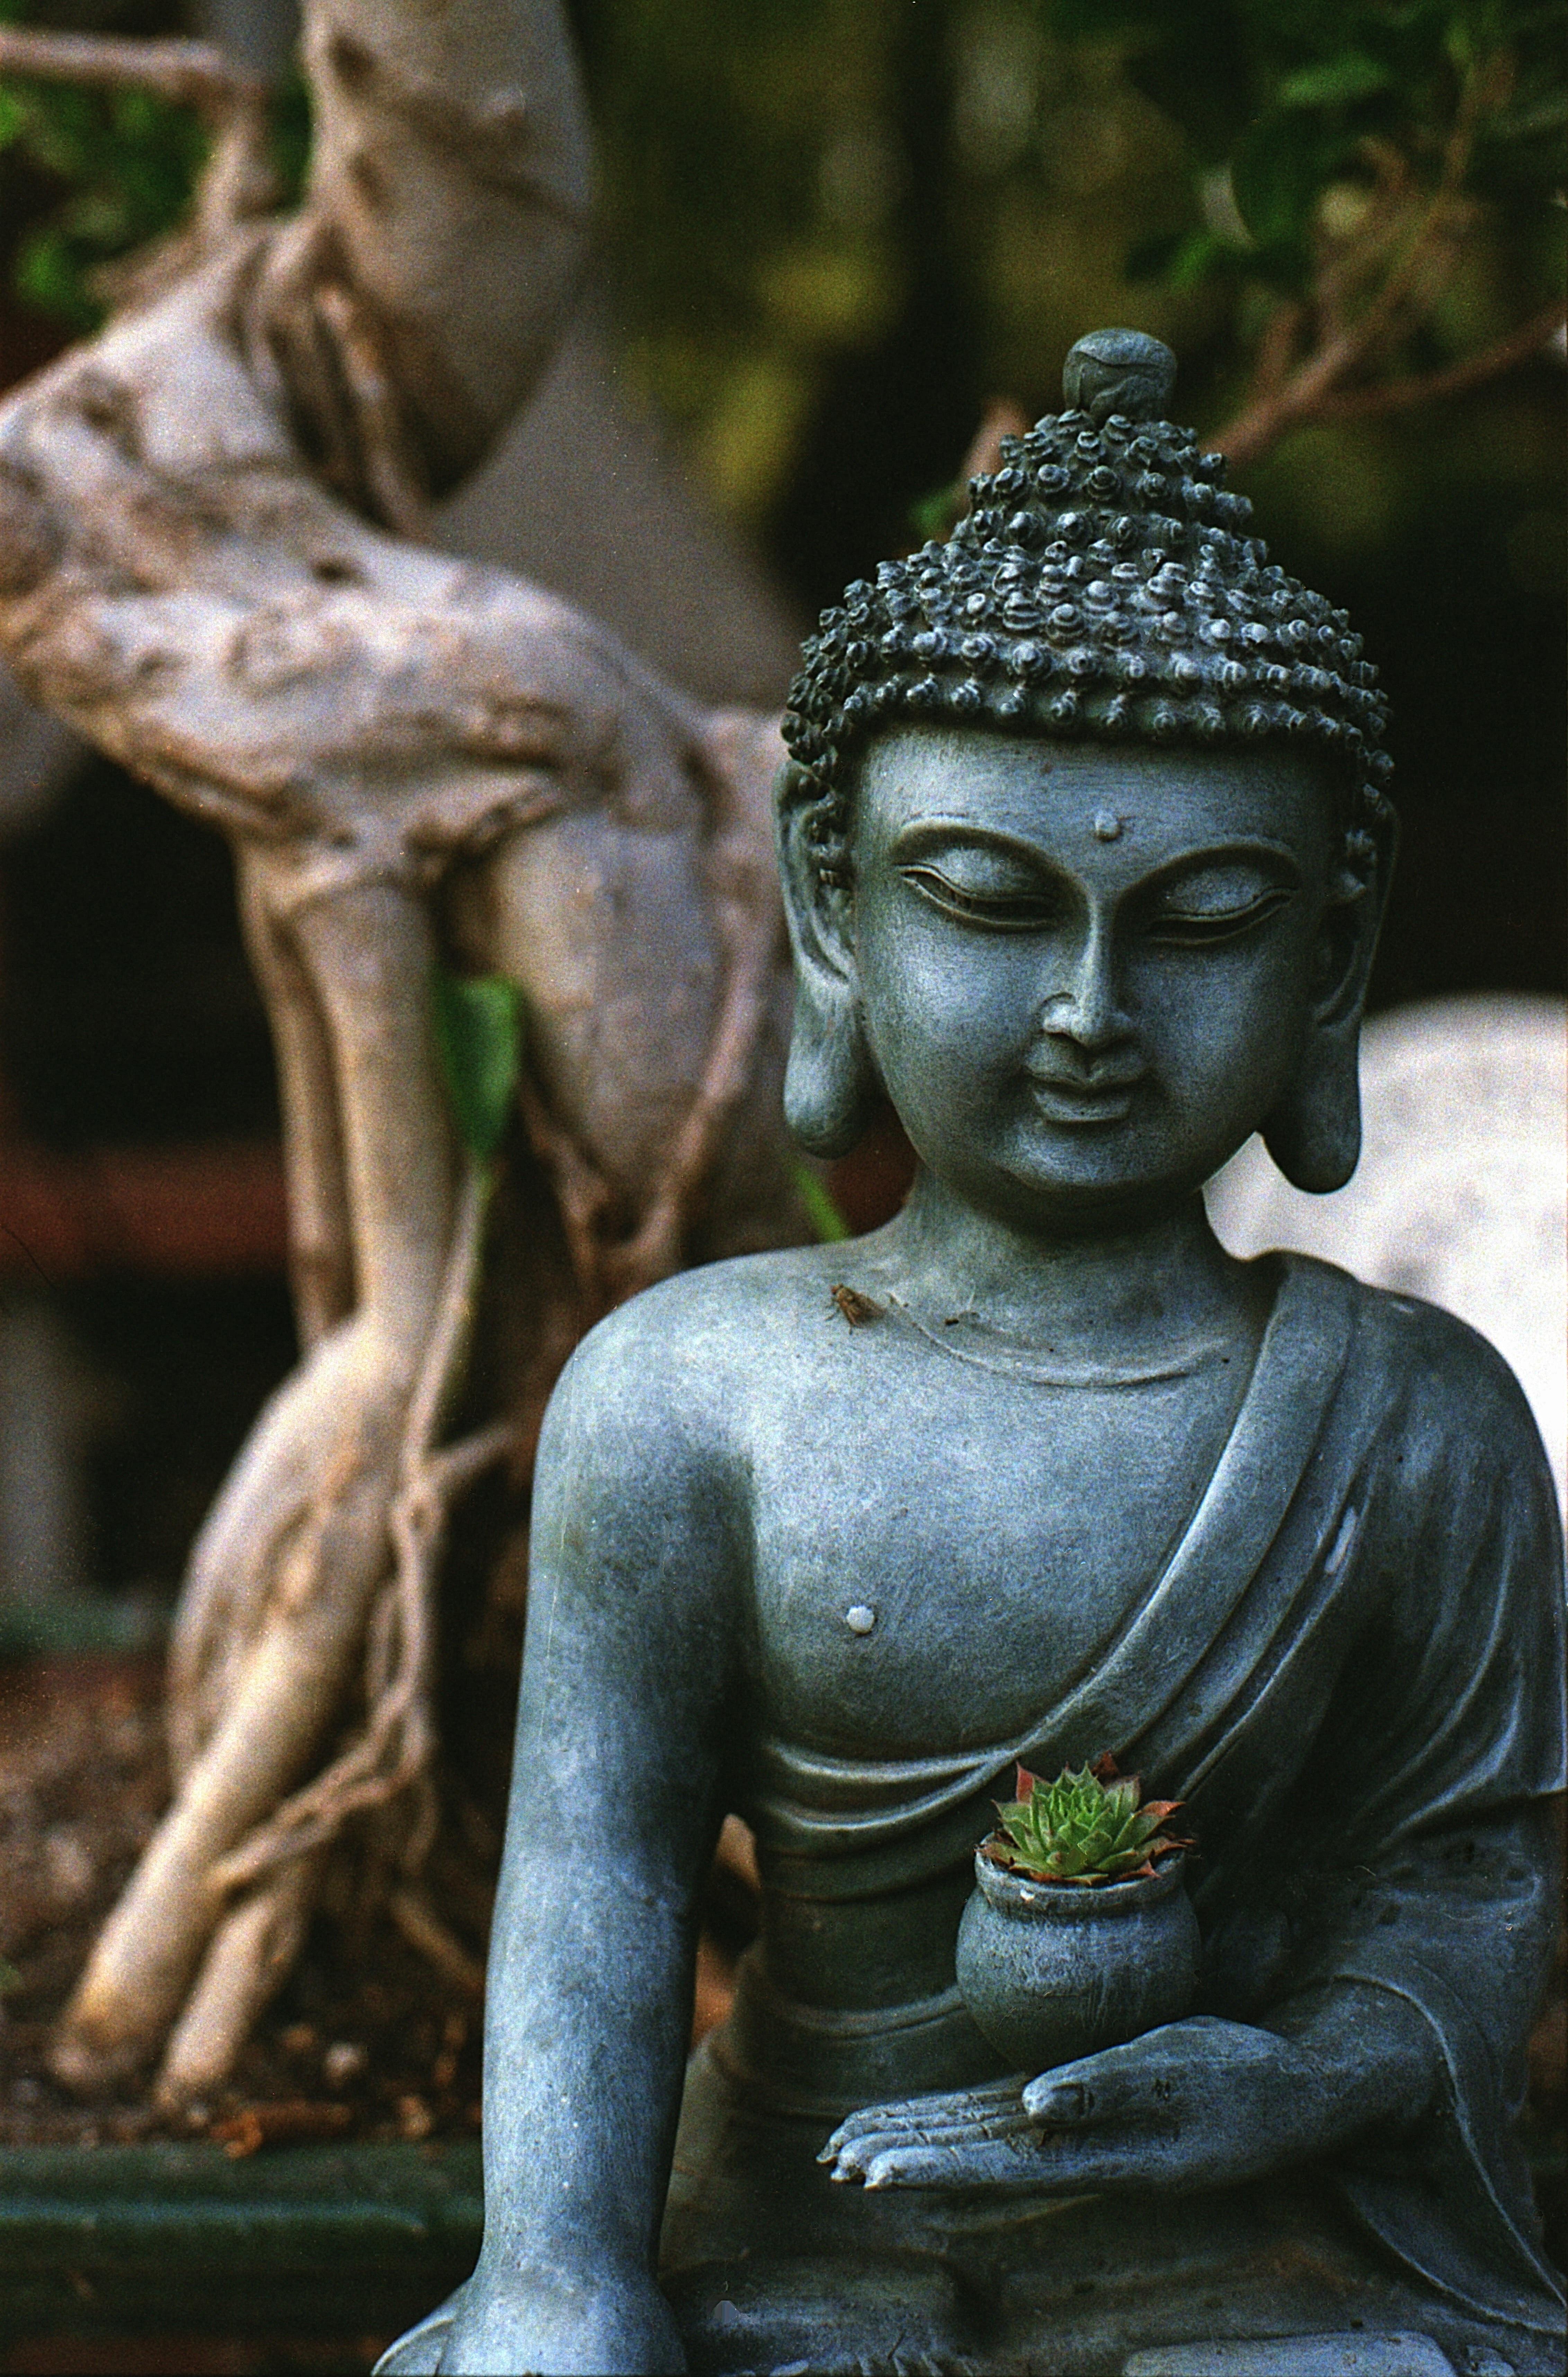 Fotos gratis rbol monumento tranquilidad estatua for Meditacion paz interior